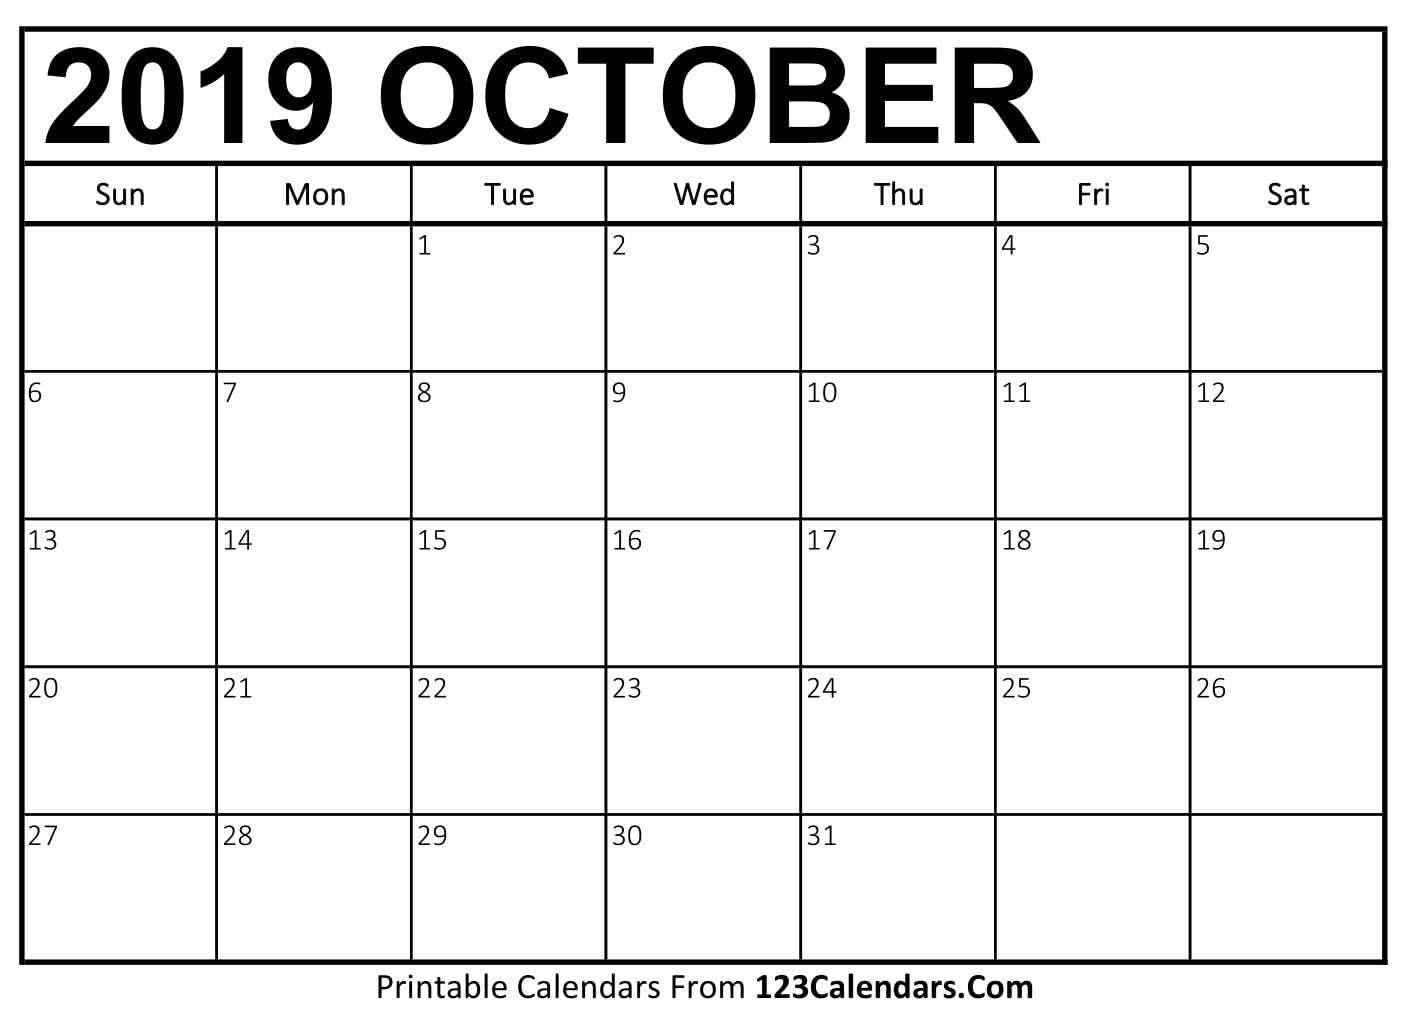 Print Out October Calendar